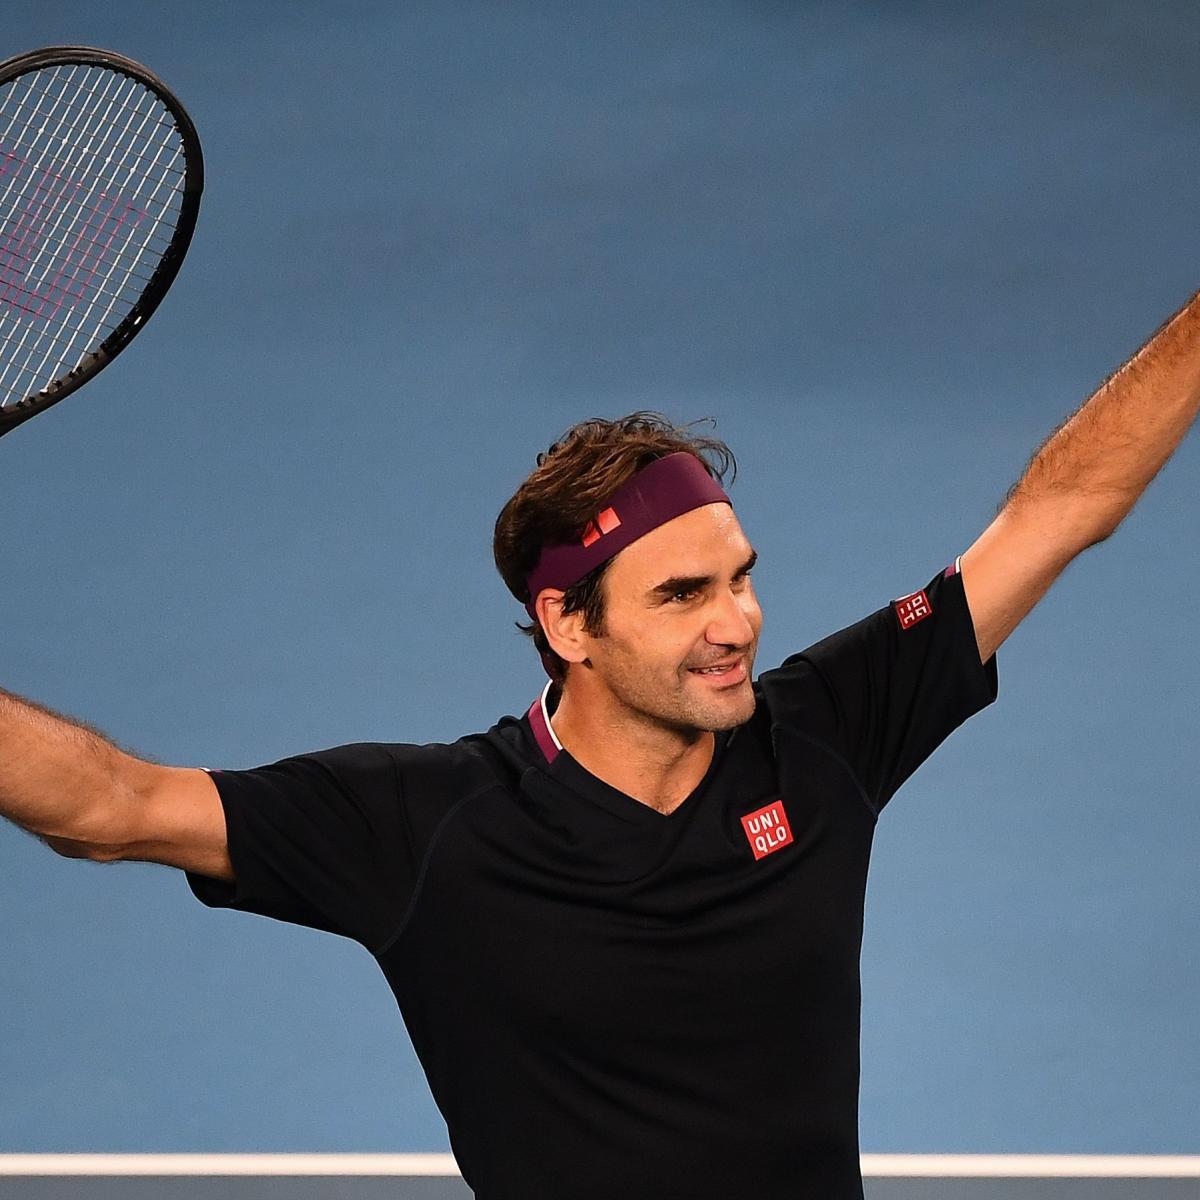 Australian Open 2020: Roger Federer, Coco Gauff Wins Highlight Friday Action